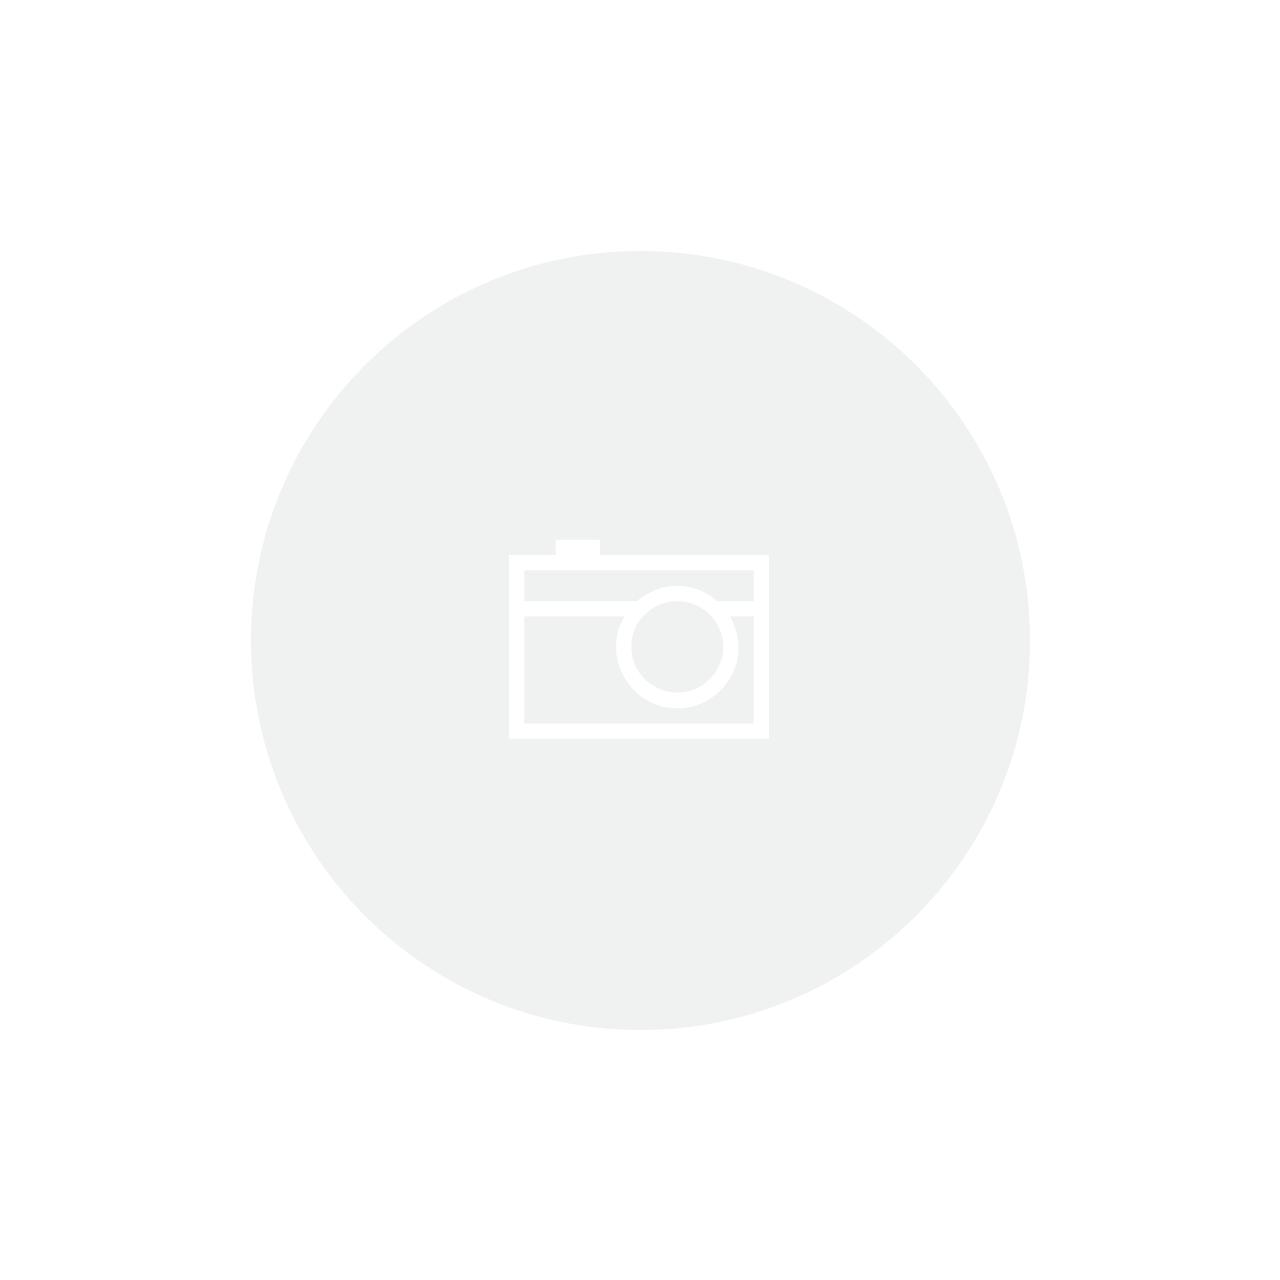 Caçarola Rasa Inox 24Cm 4,70 Litros Duo Silicone Tramontina